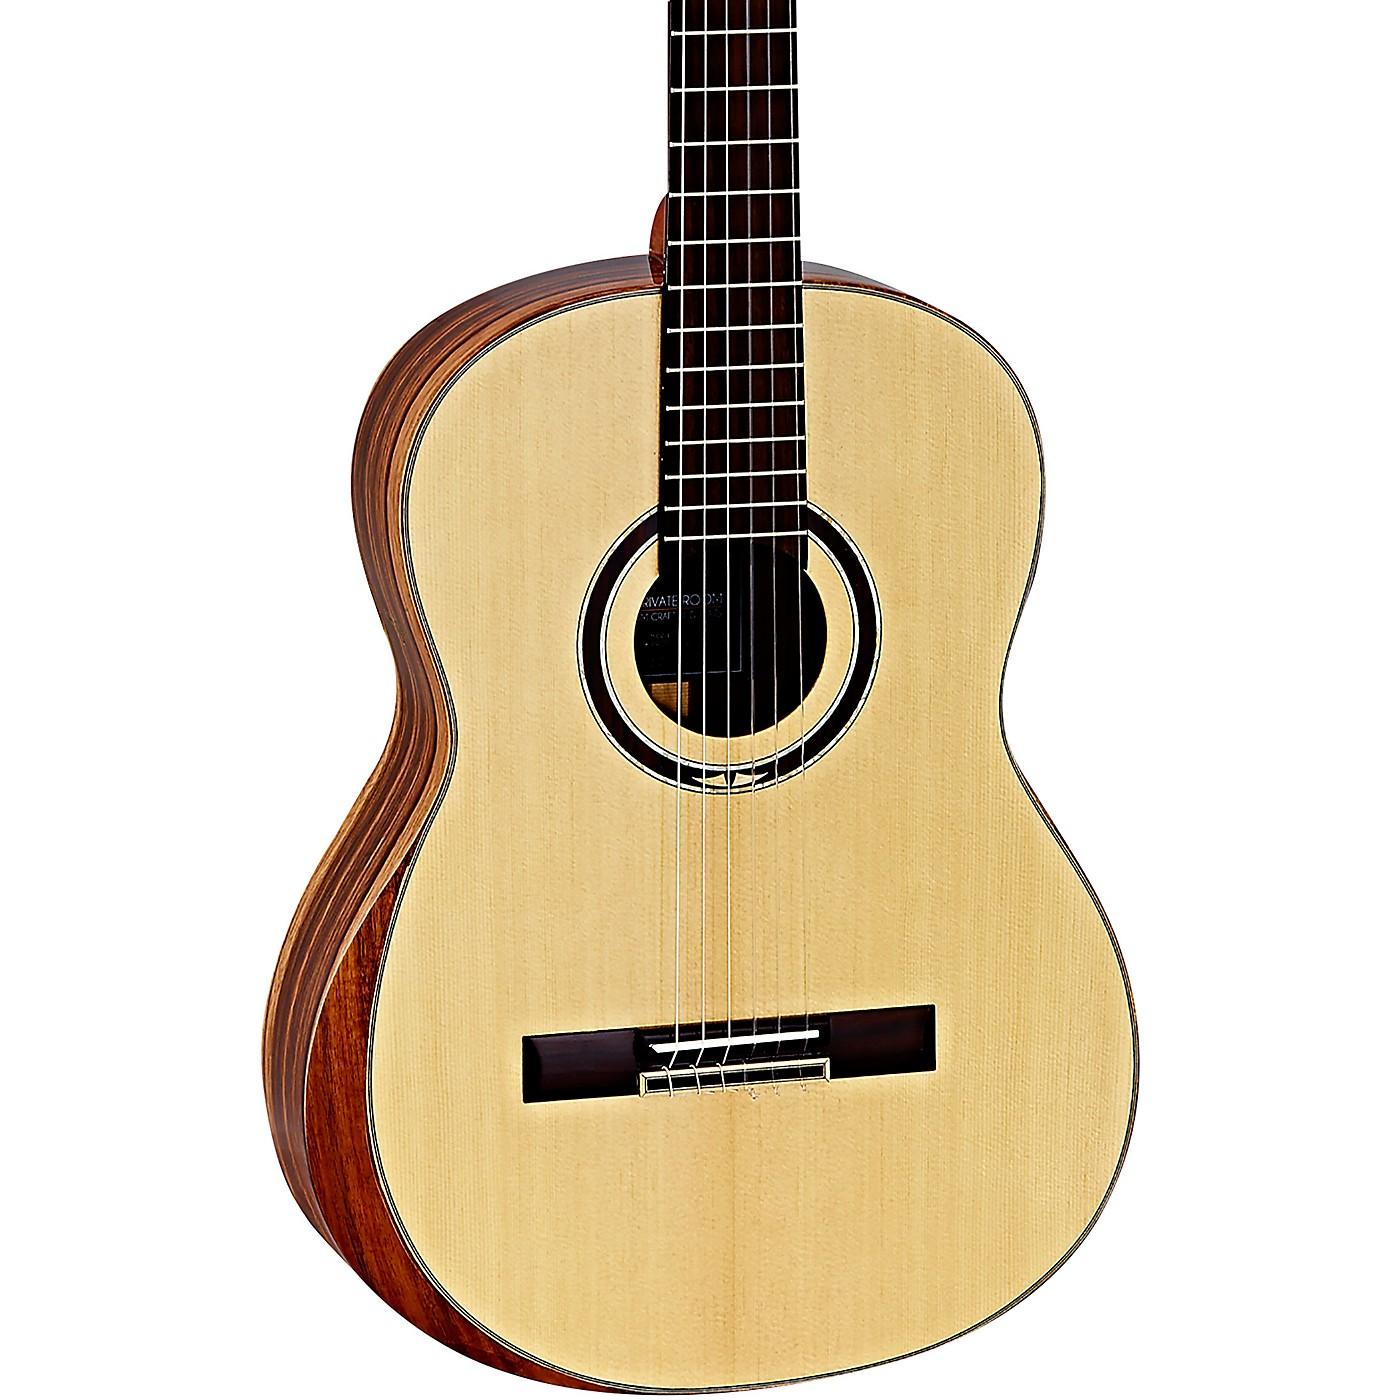 Ortega STRIPED SUITE Nylon Classical Acoustic Guitar thumbnail